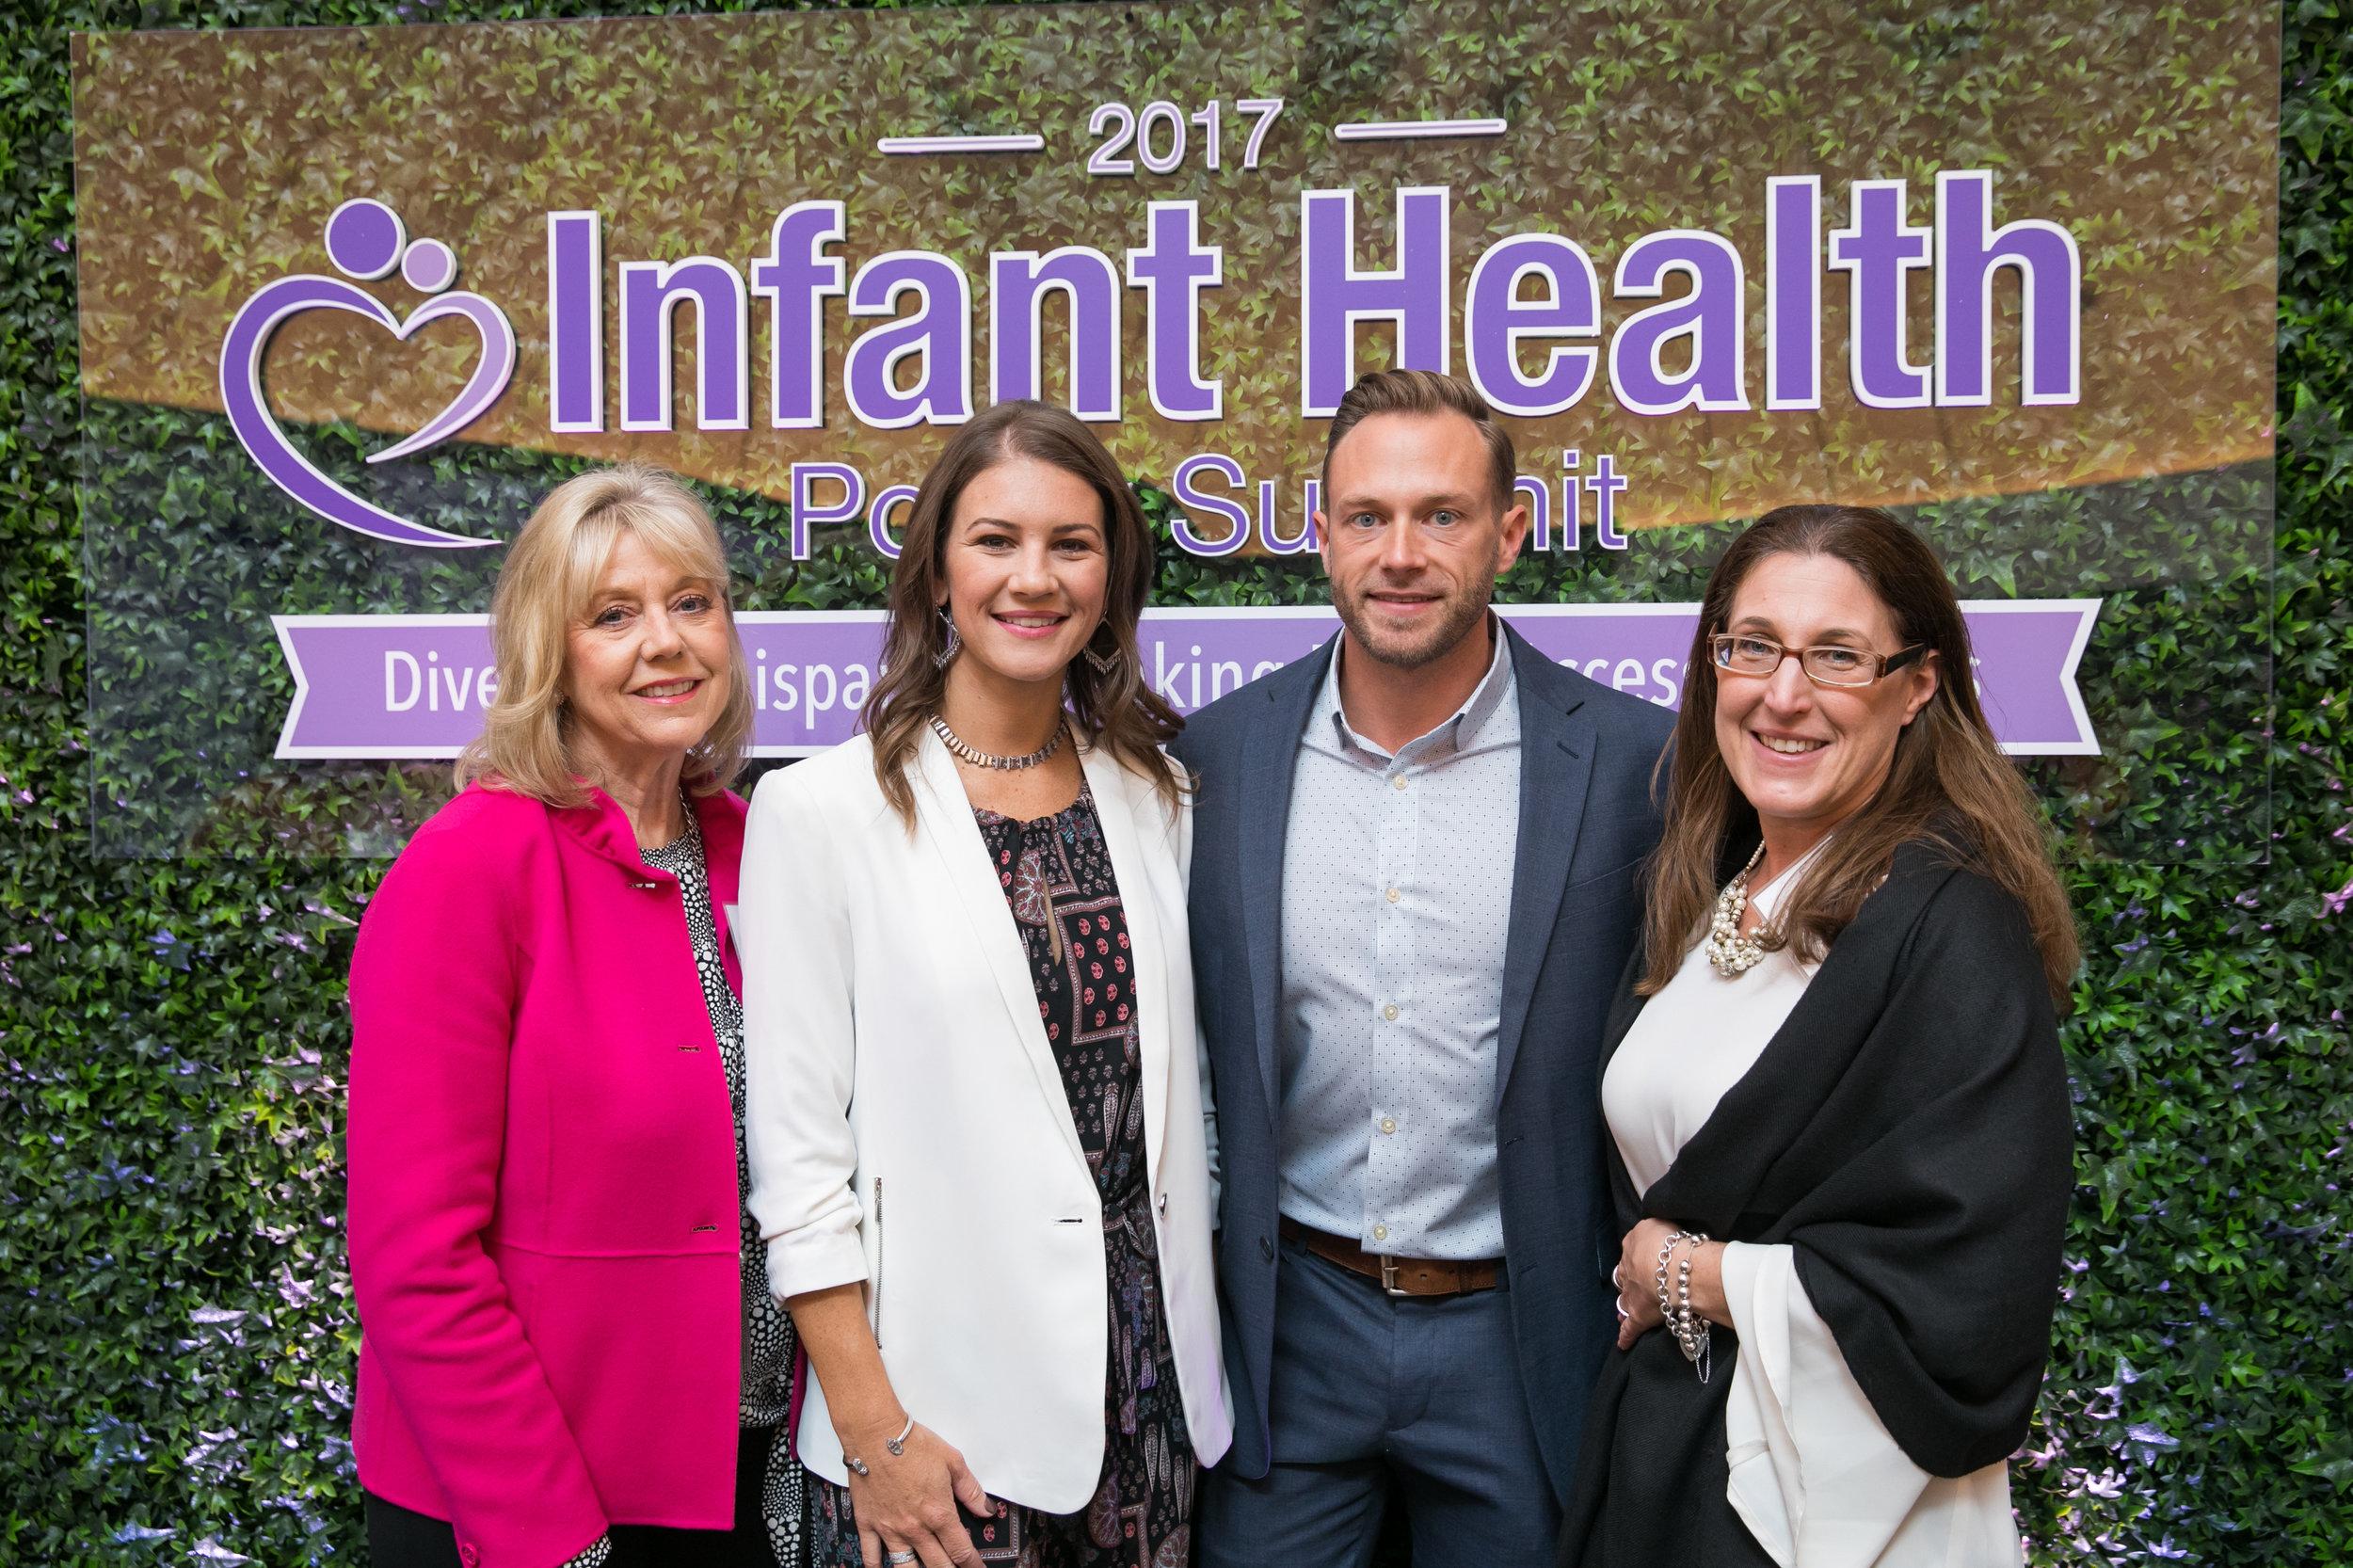 Infant Health Policy Summit - Jason Dixson Photography - 125615 - 0714.jpg